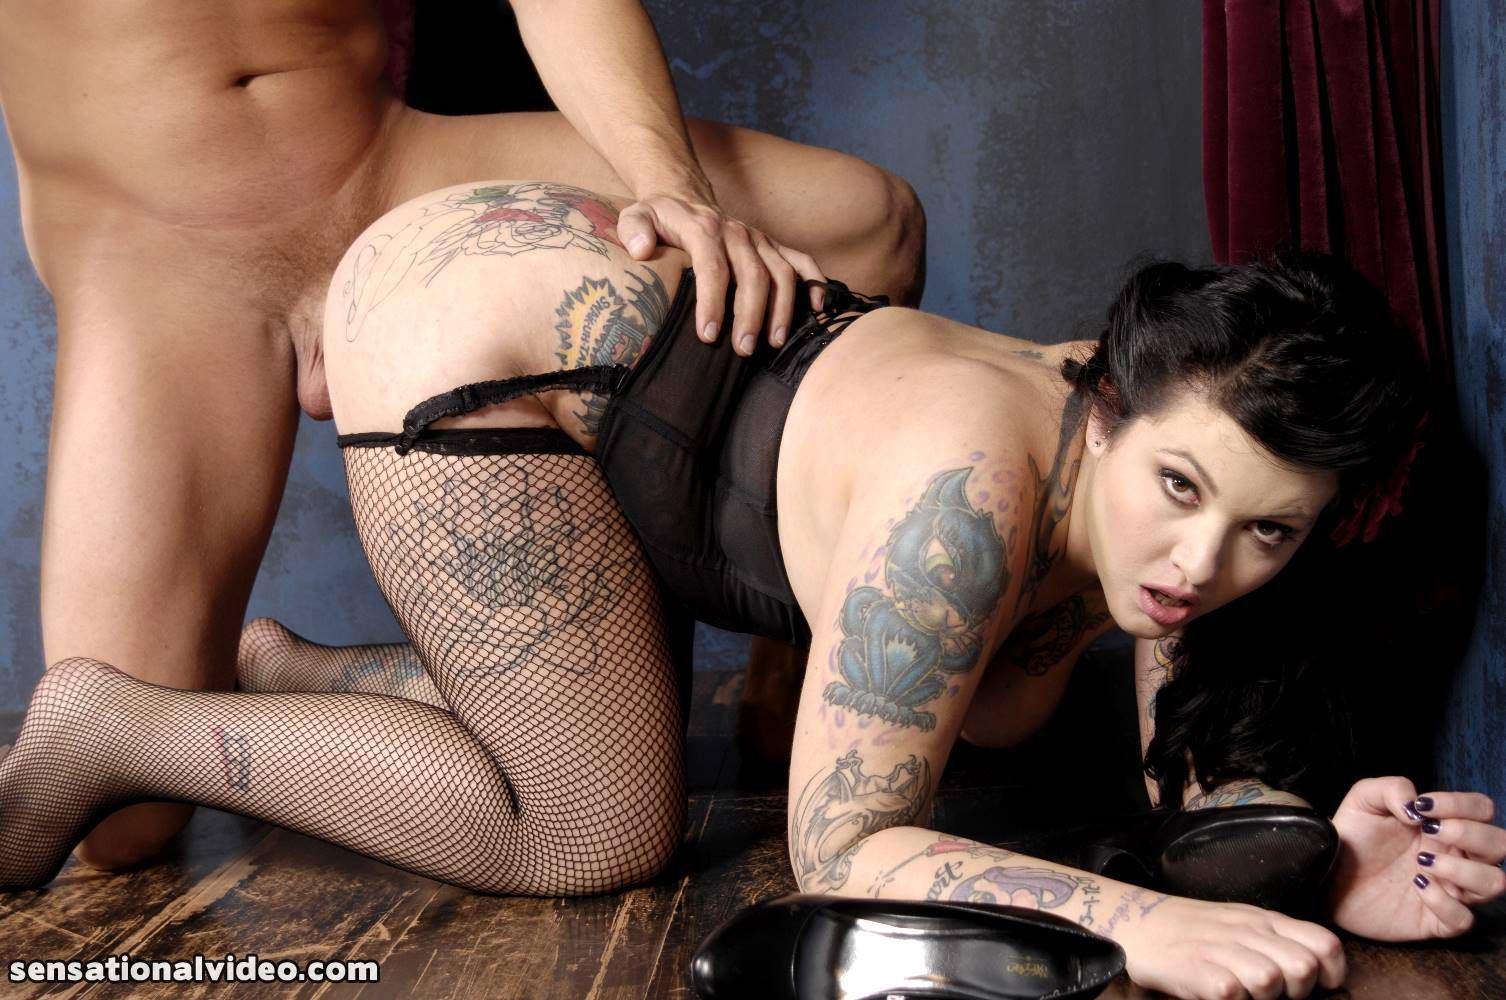 Lara dutta sexy photo free porn